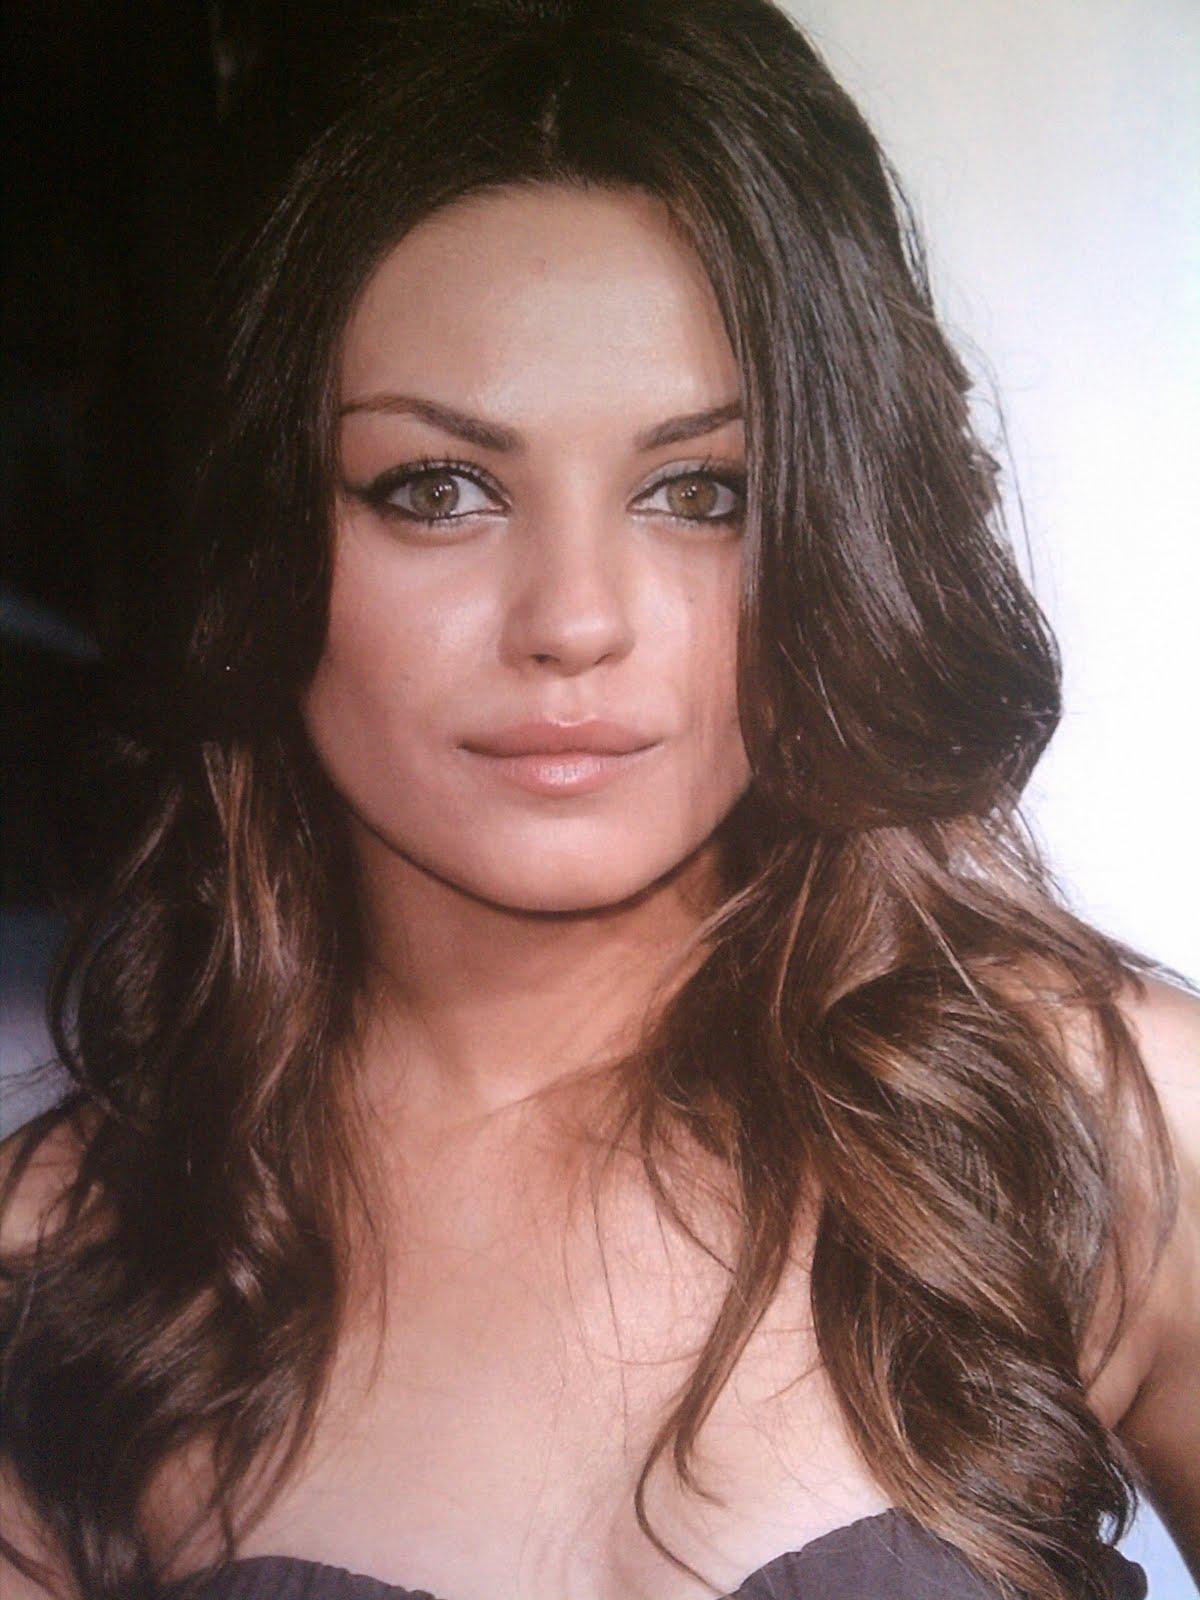 Mila Kunis Gets Cum On Her Face